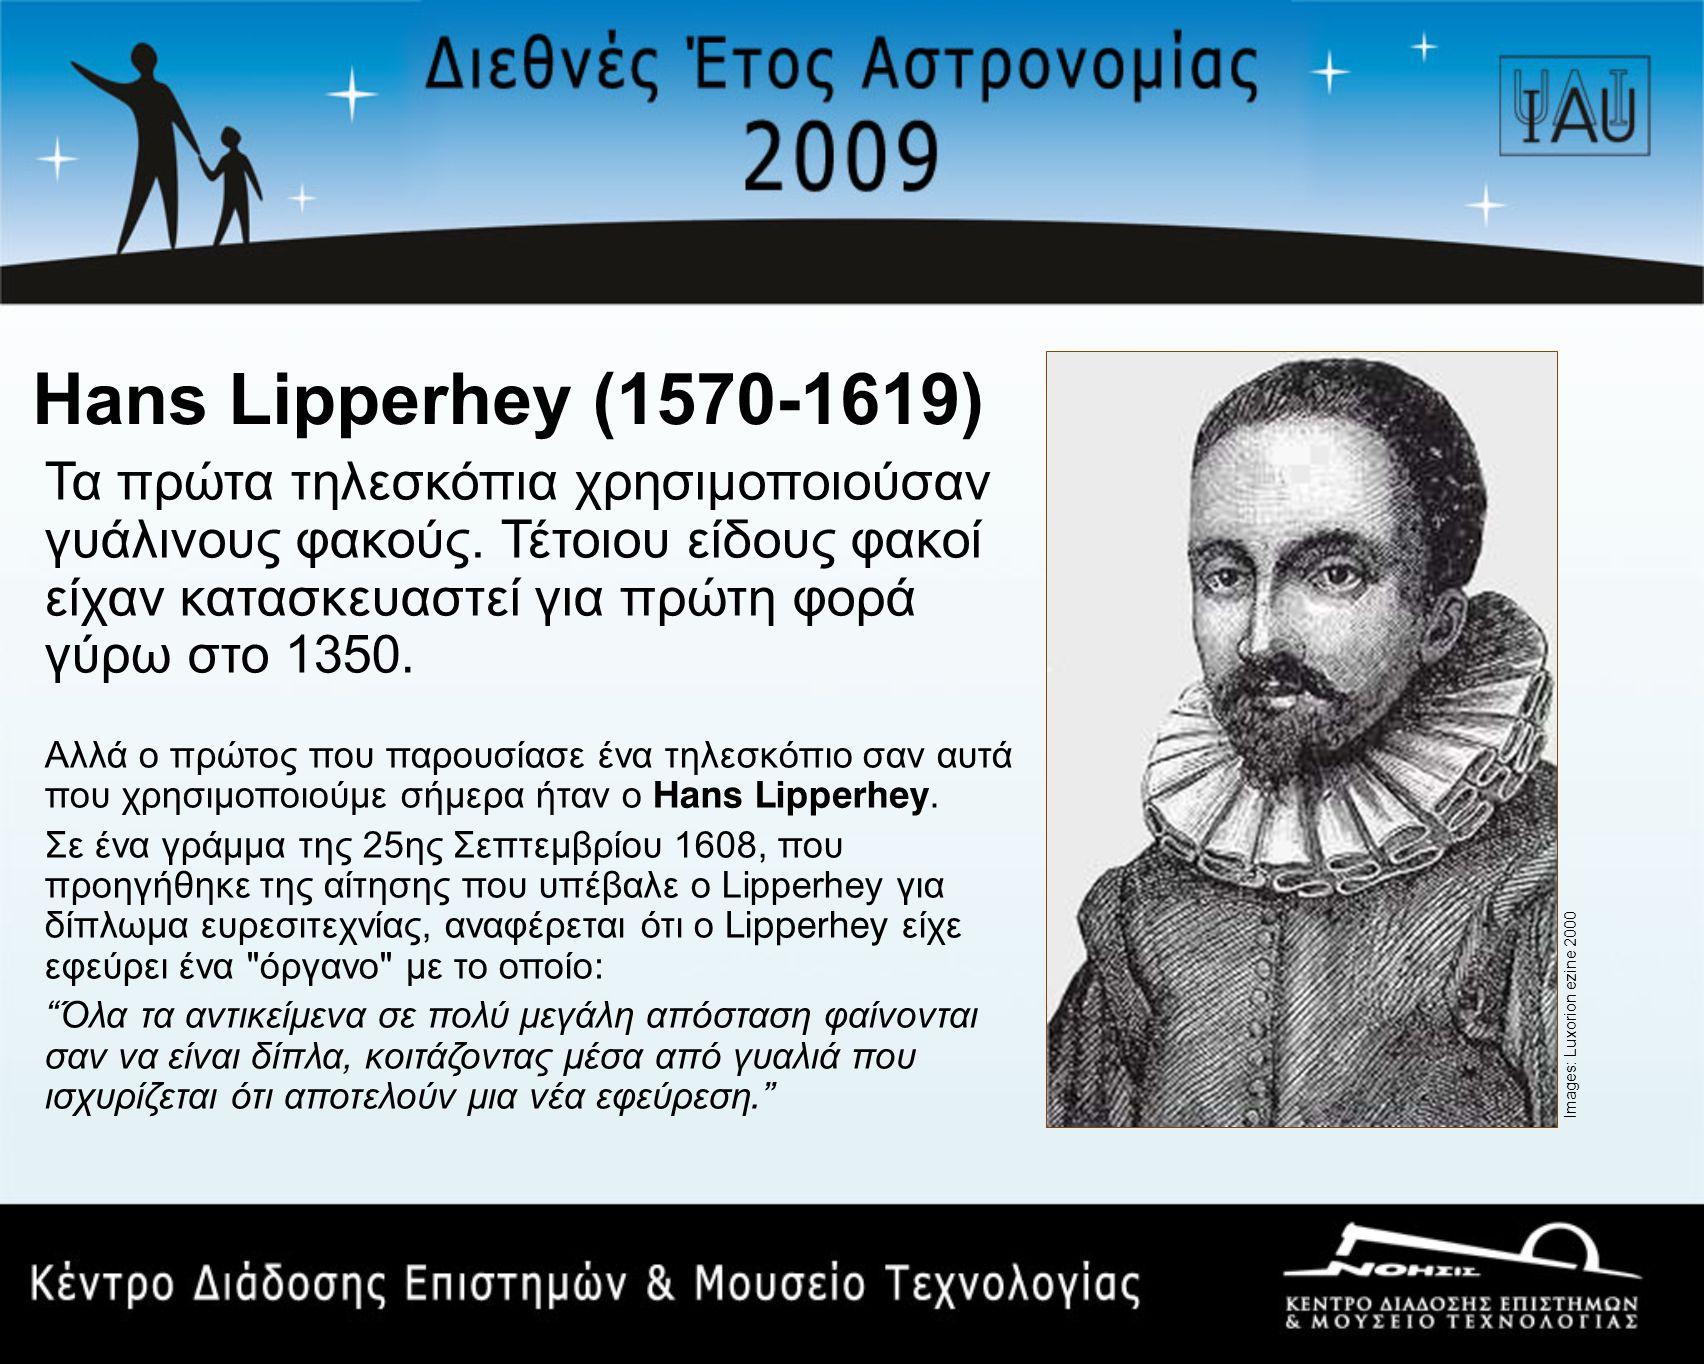 Hans Lipperhey (1570-1619) Τα πρώτα τηλεσκόπια χρησιμοποιούσαν γυάλινους φακούς.